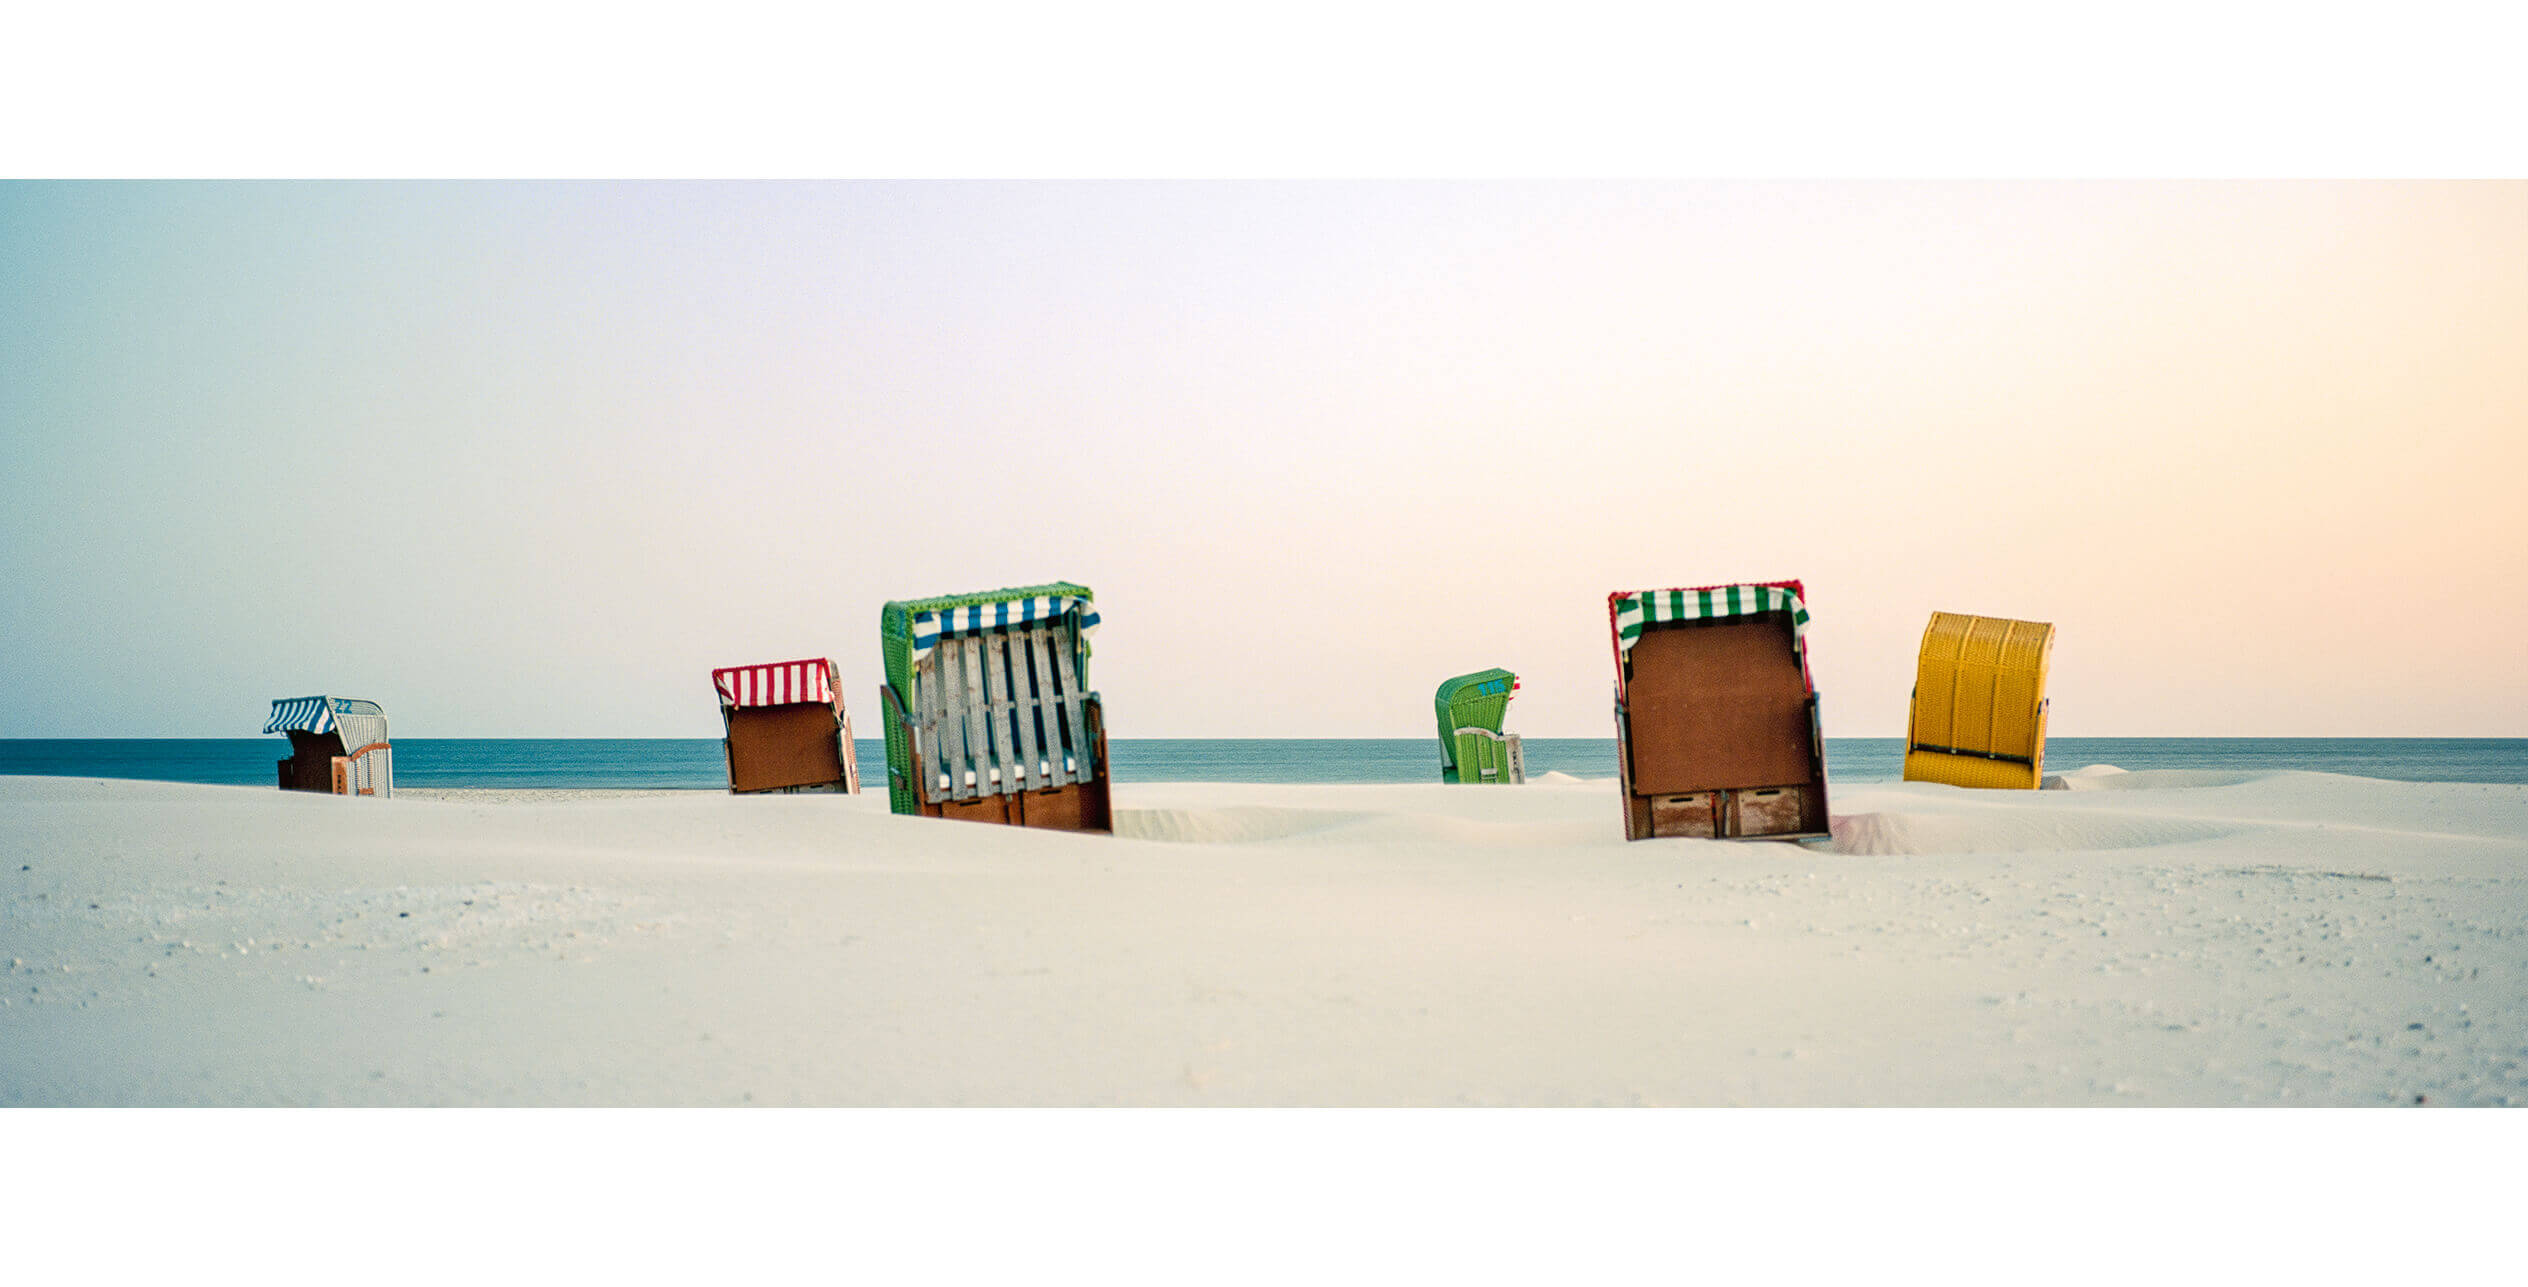 Postkarte Fotografie El Dorado Amrum Fahrradverleih Strandkörbe